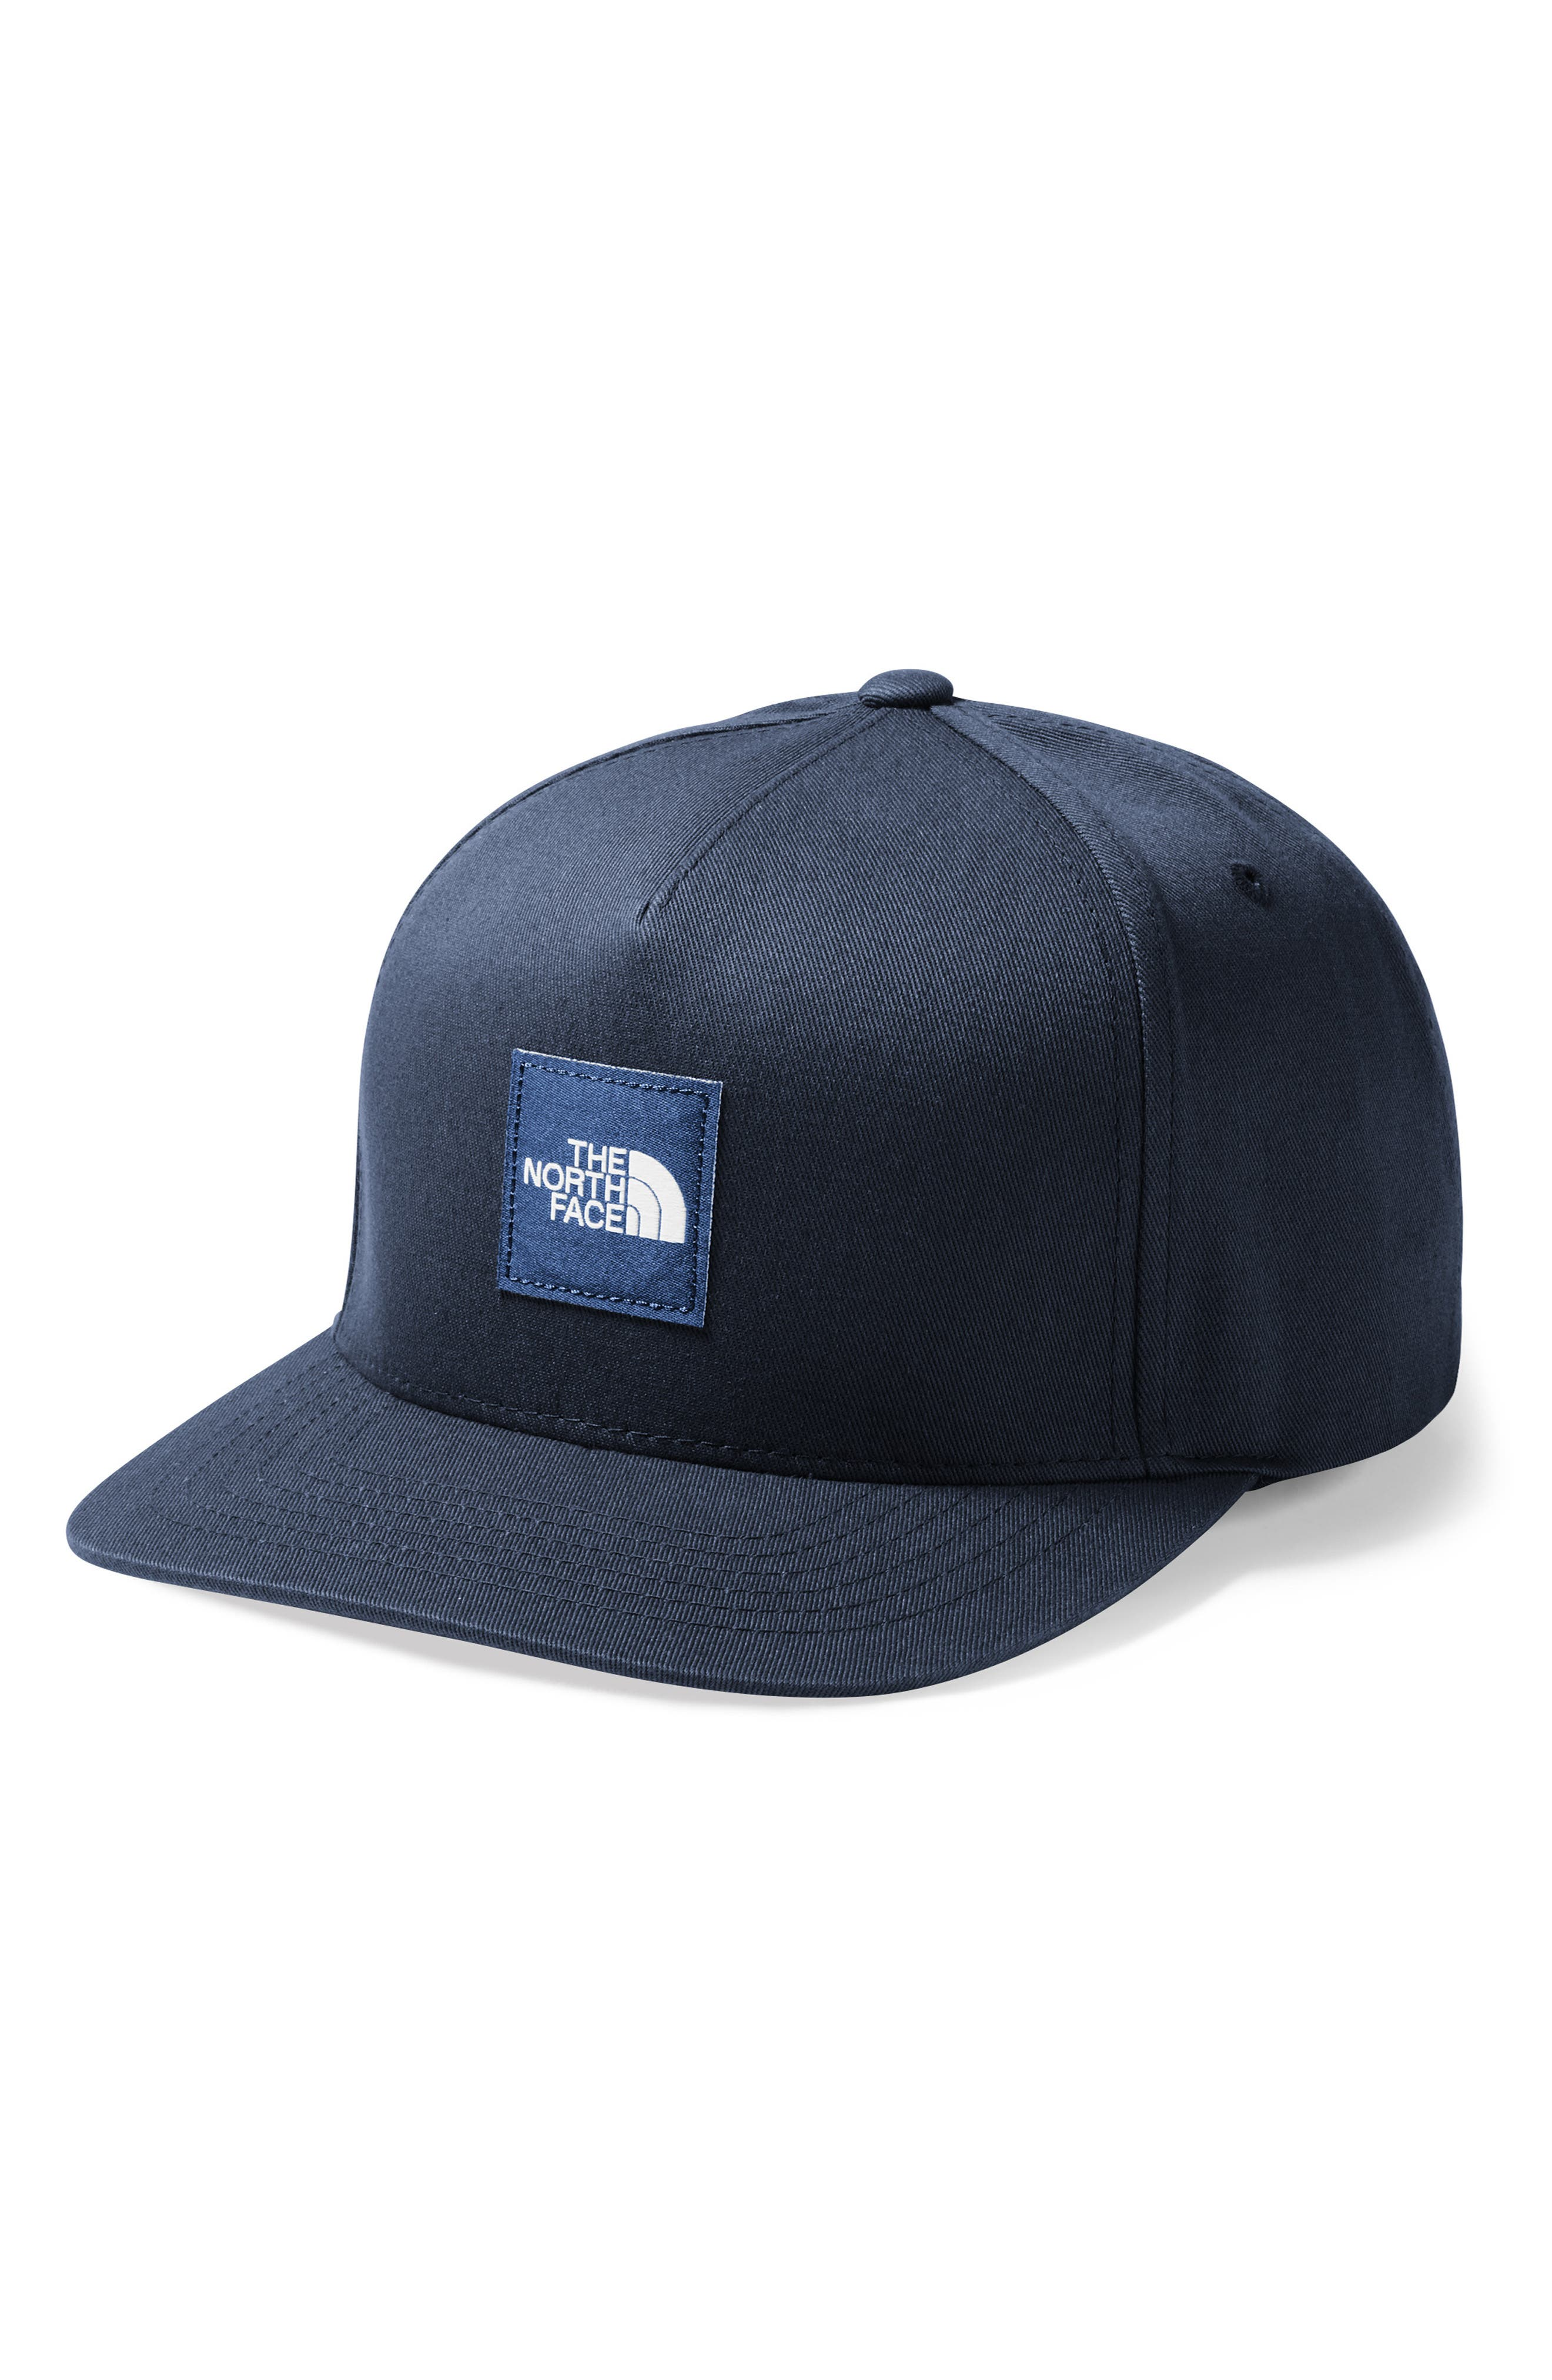 Street Baseball Cap,                         Main,                         color, URBAN NAVY/ SHADY BLUE